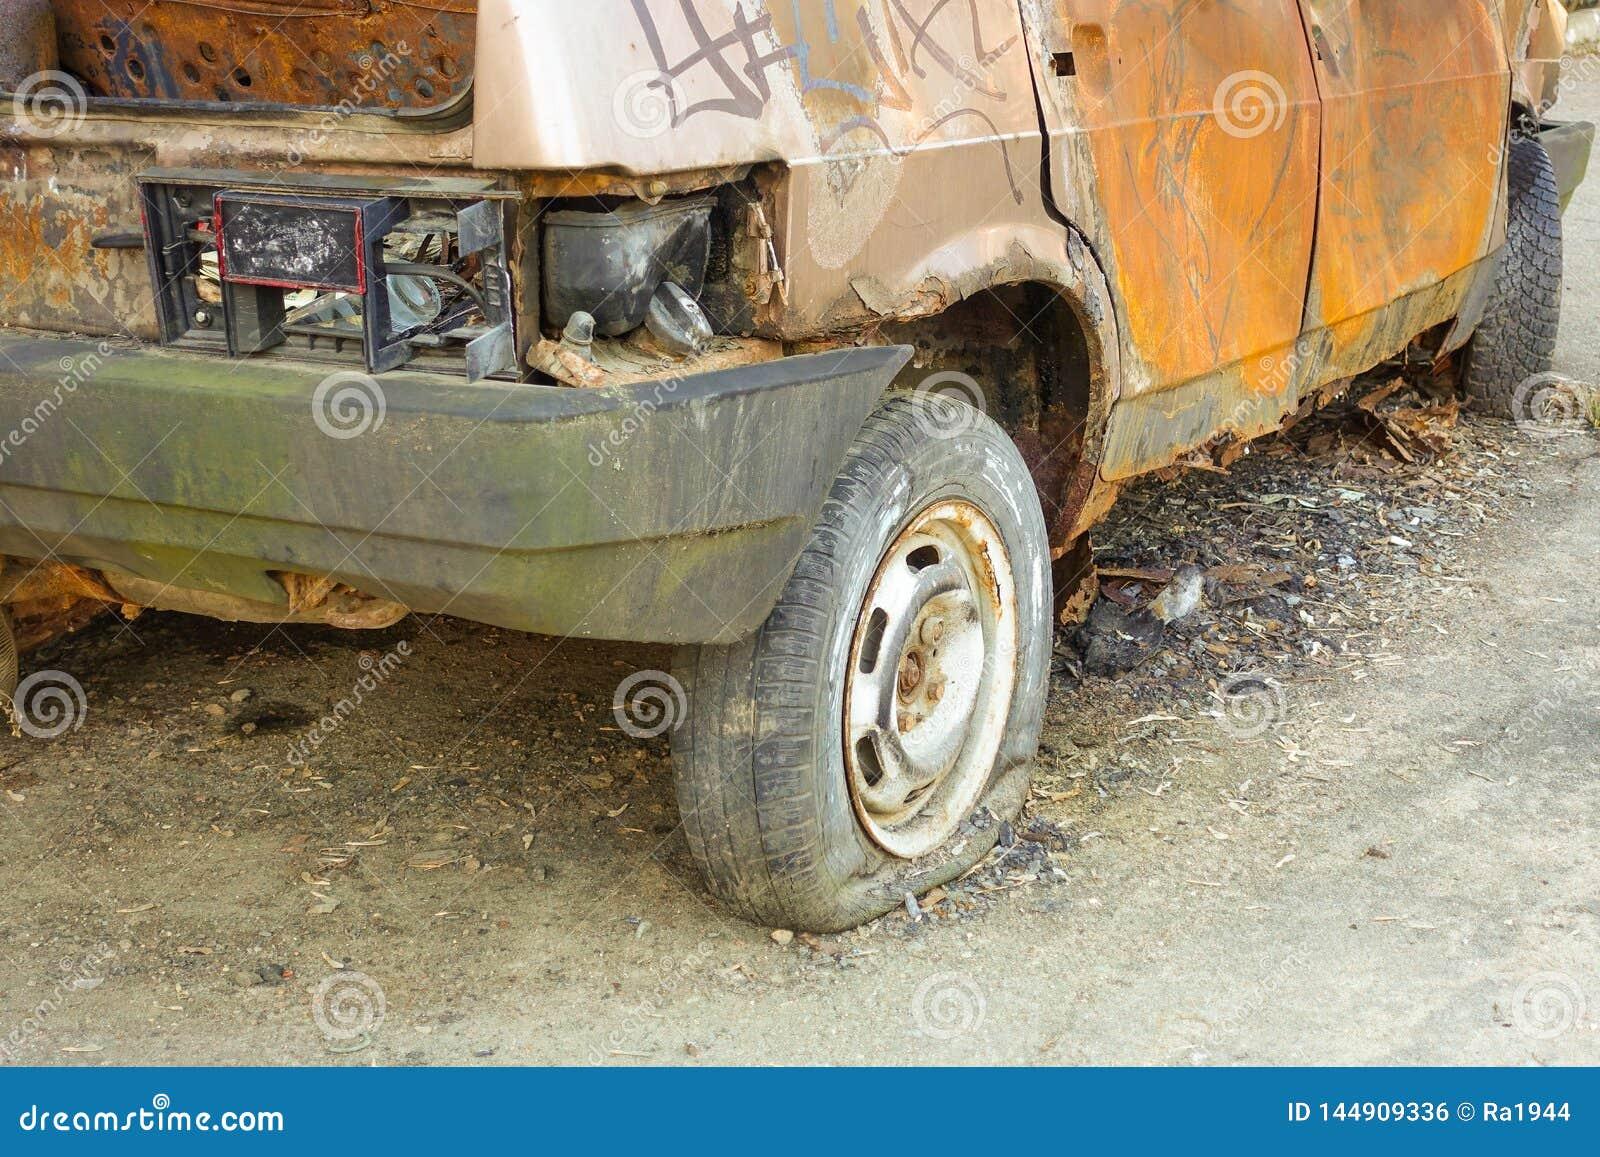 Burnt, abandoned passenger car close-up. Russia